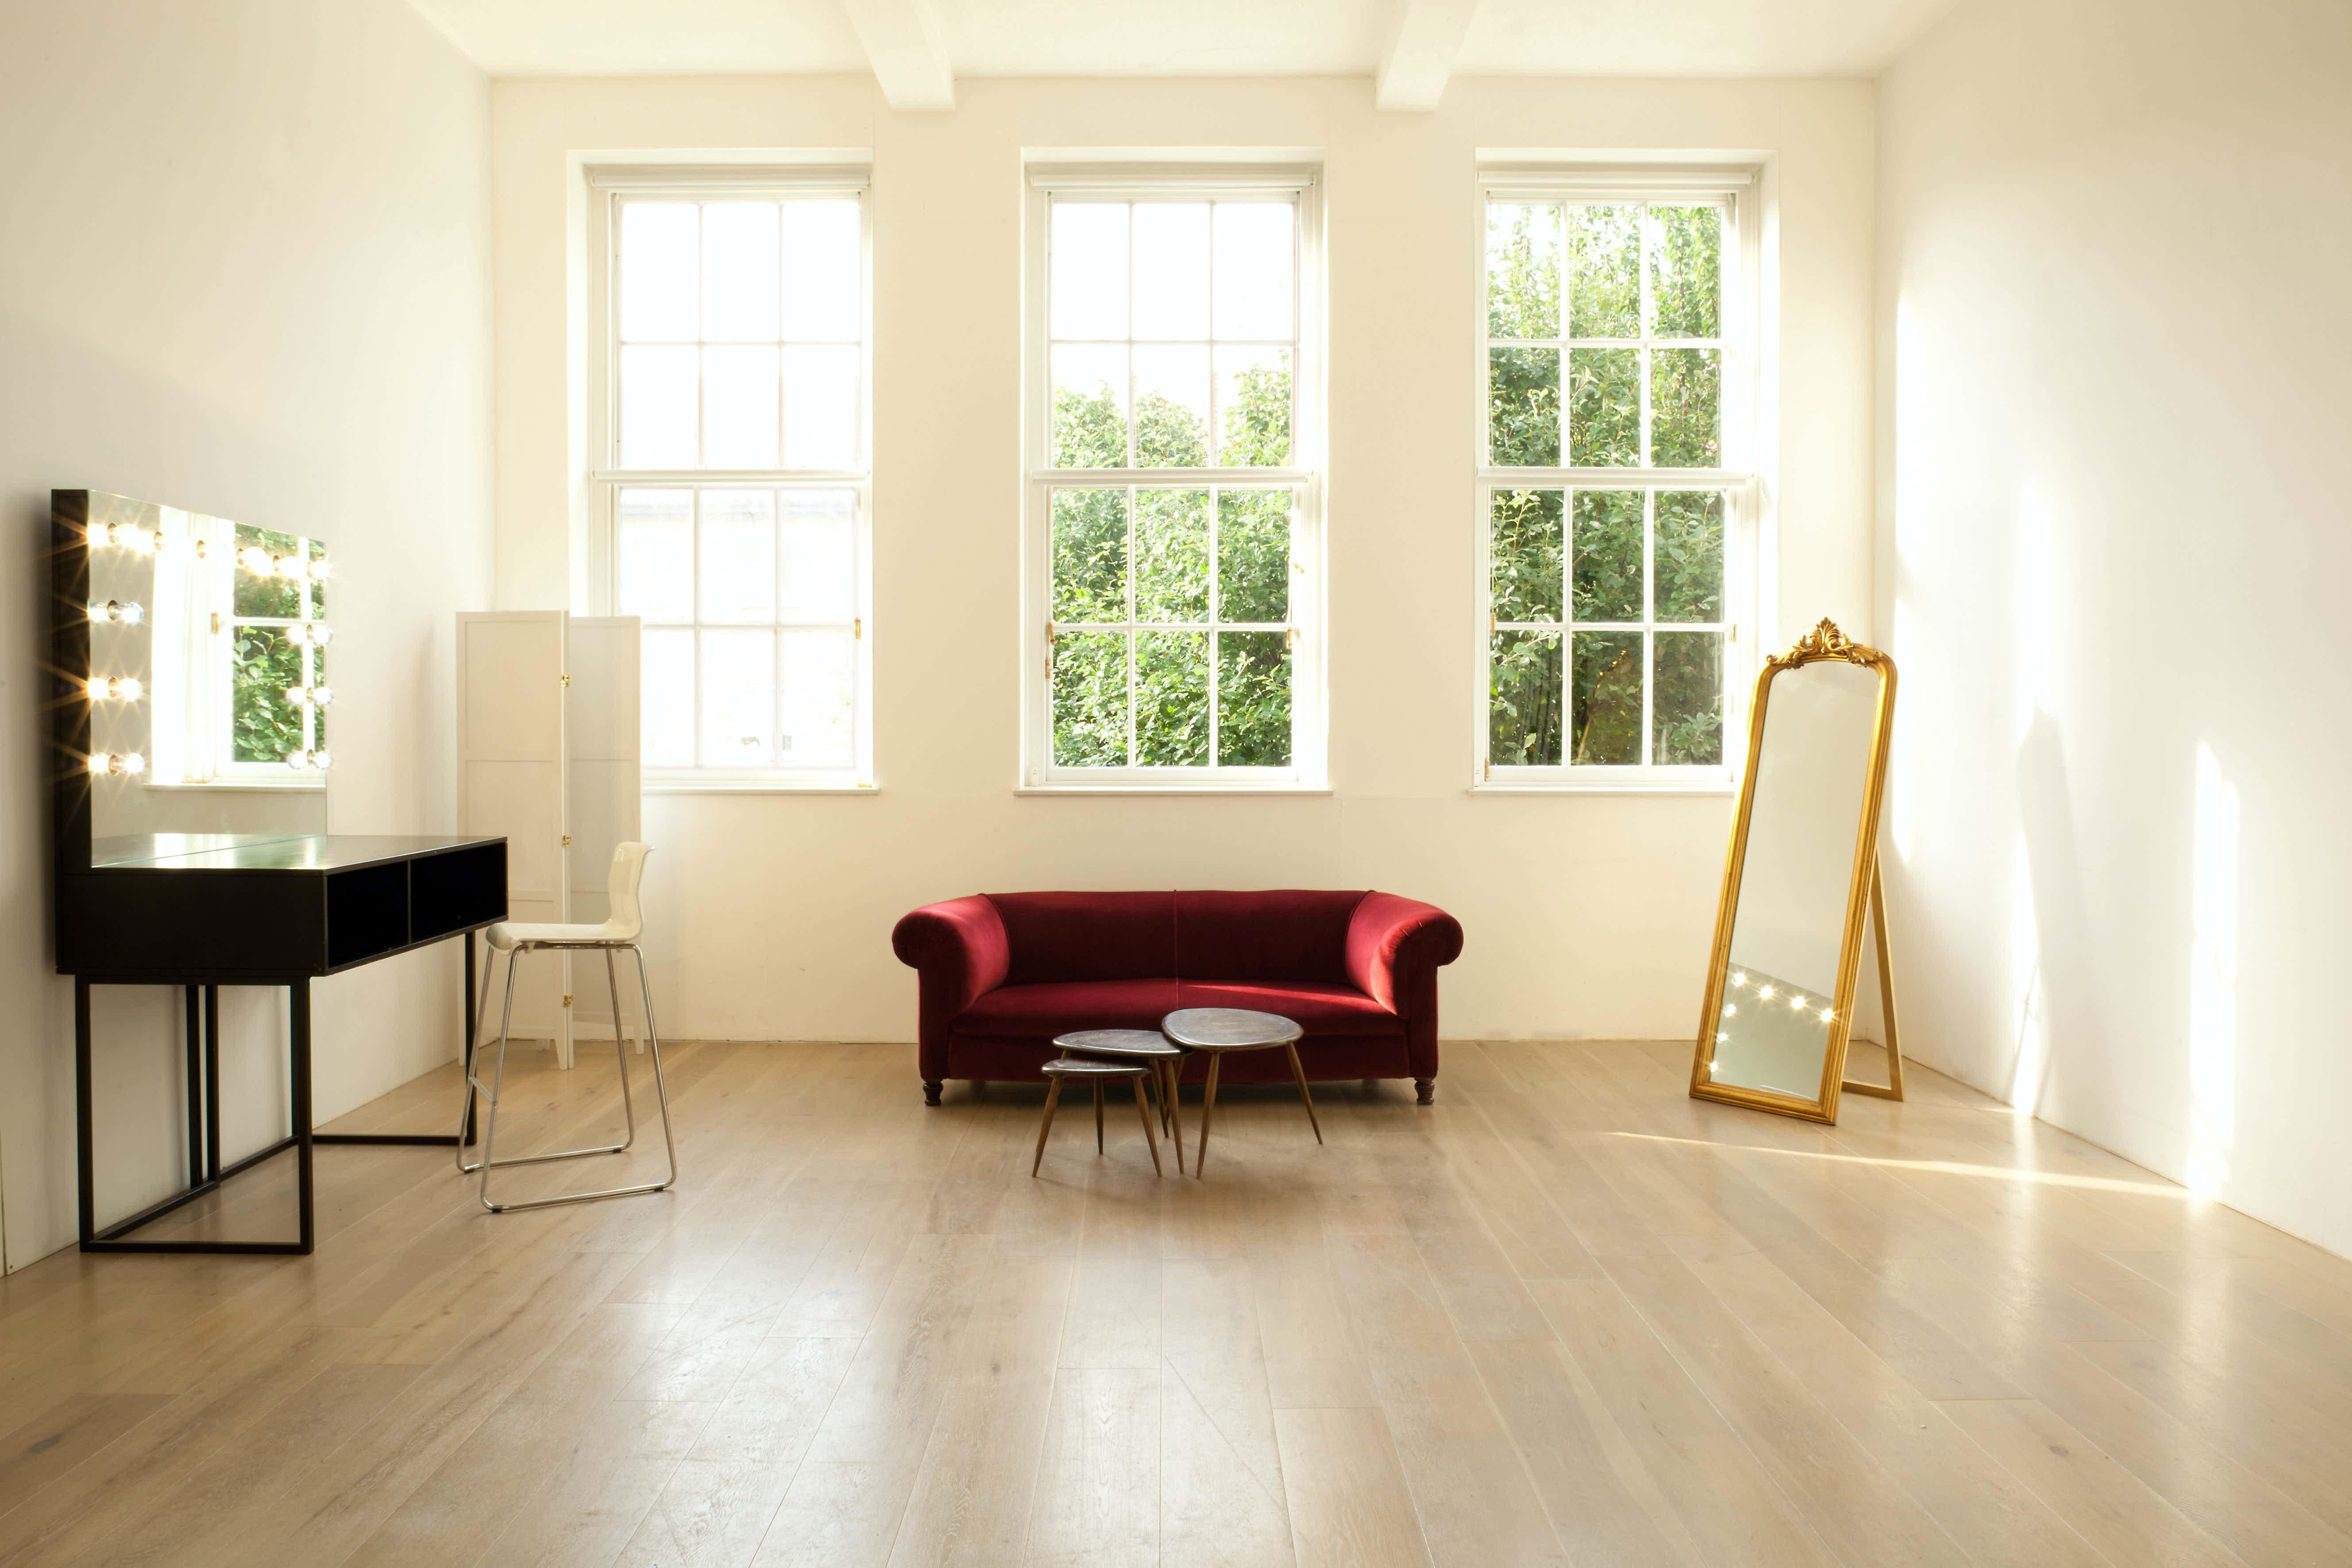 Shrewsbury Room, Sunbeam Studios